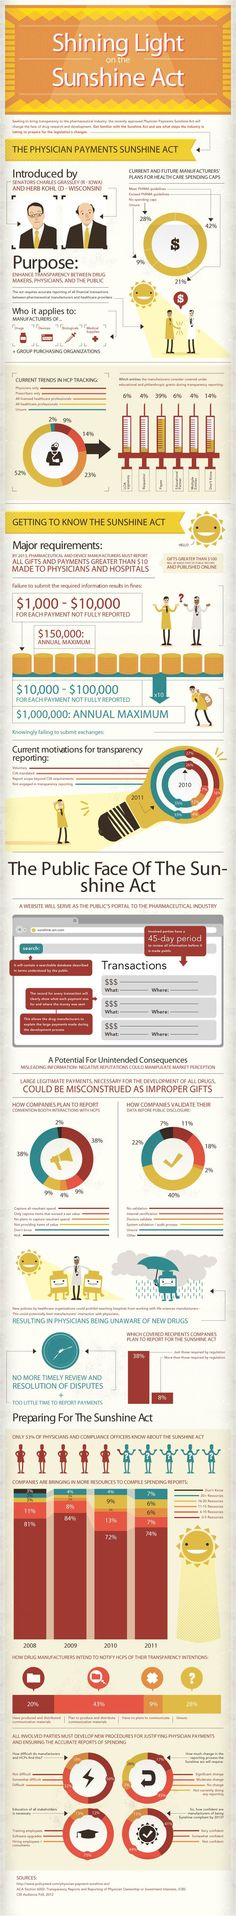 Shining light on the Physicians Sunshine Act.....